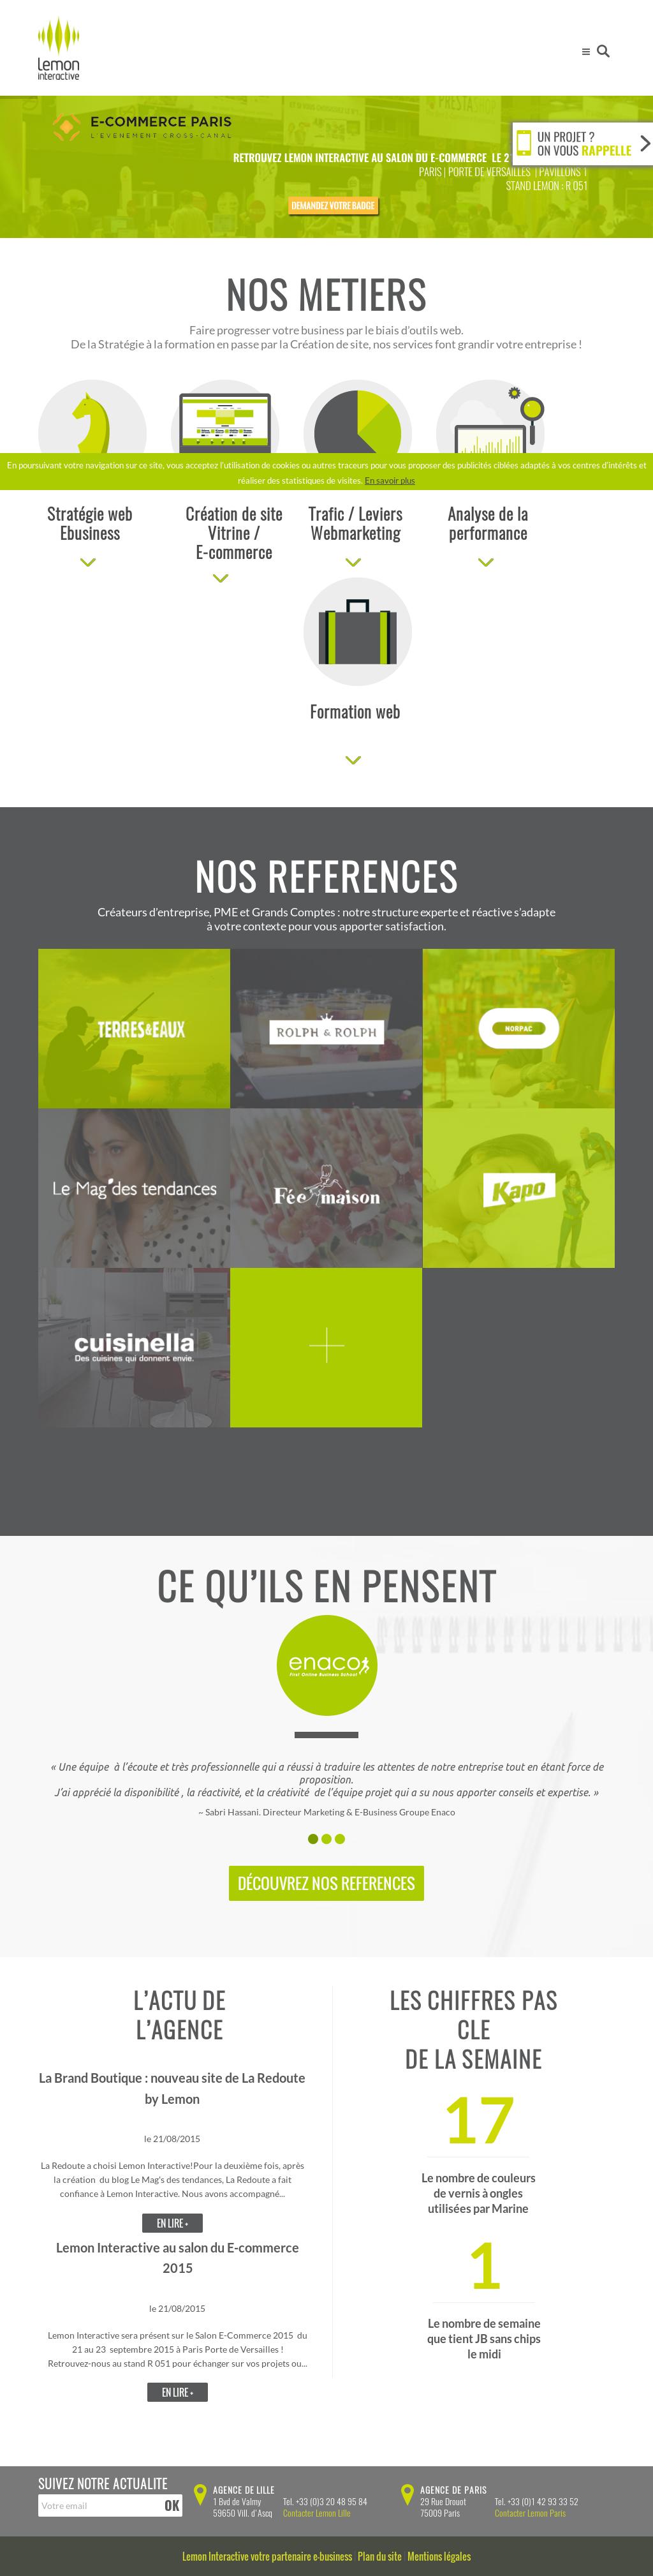 Www Cuisinella Satisfaction Com lemon interactive competitors, revenue and employees - owler